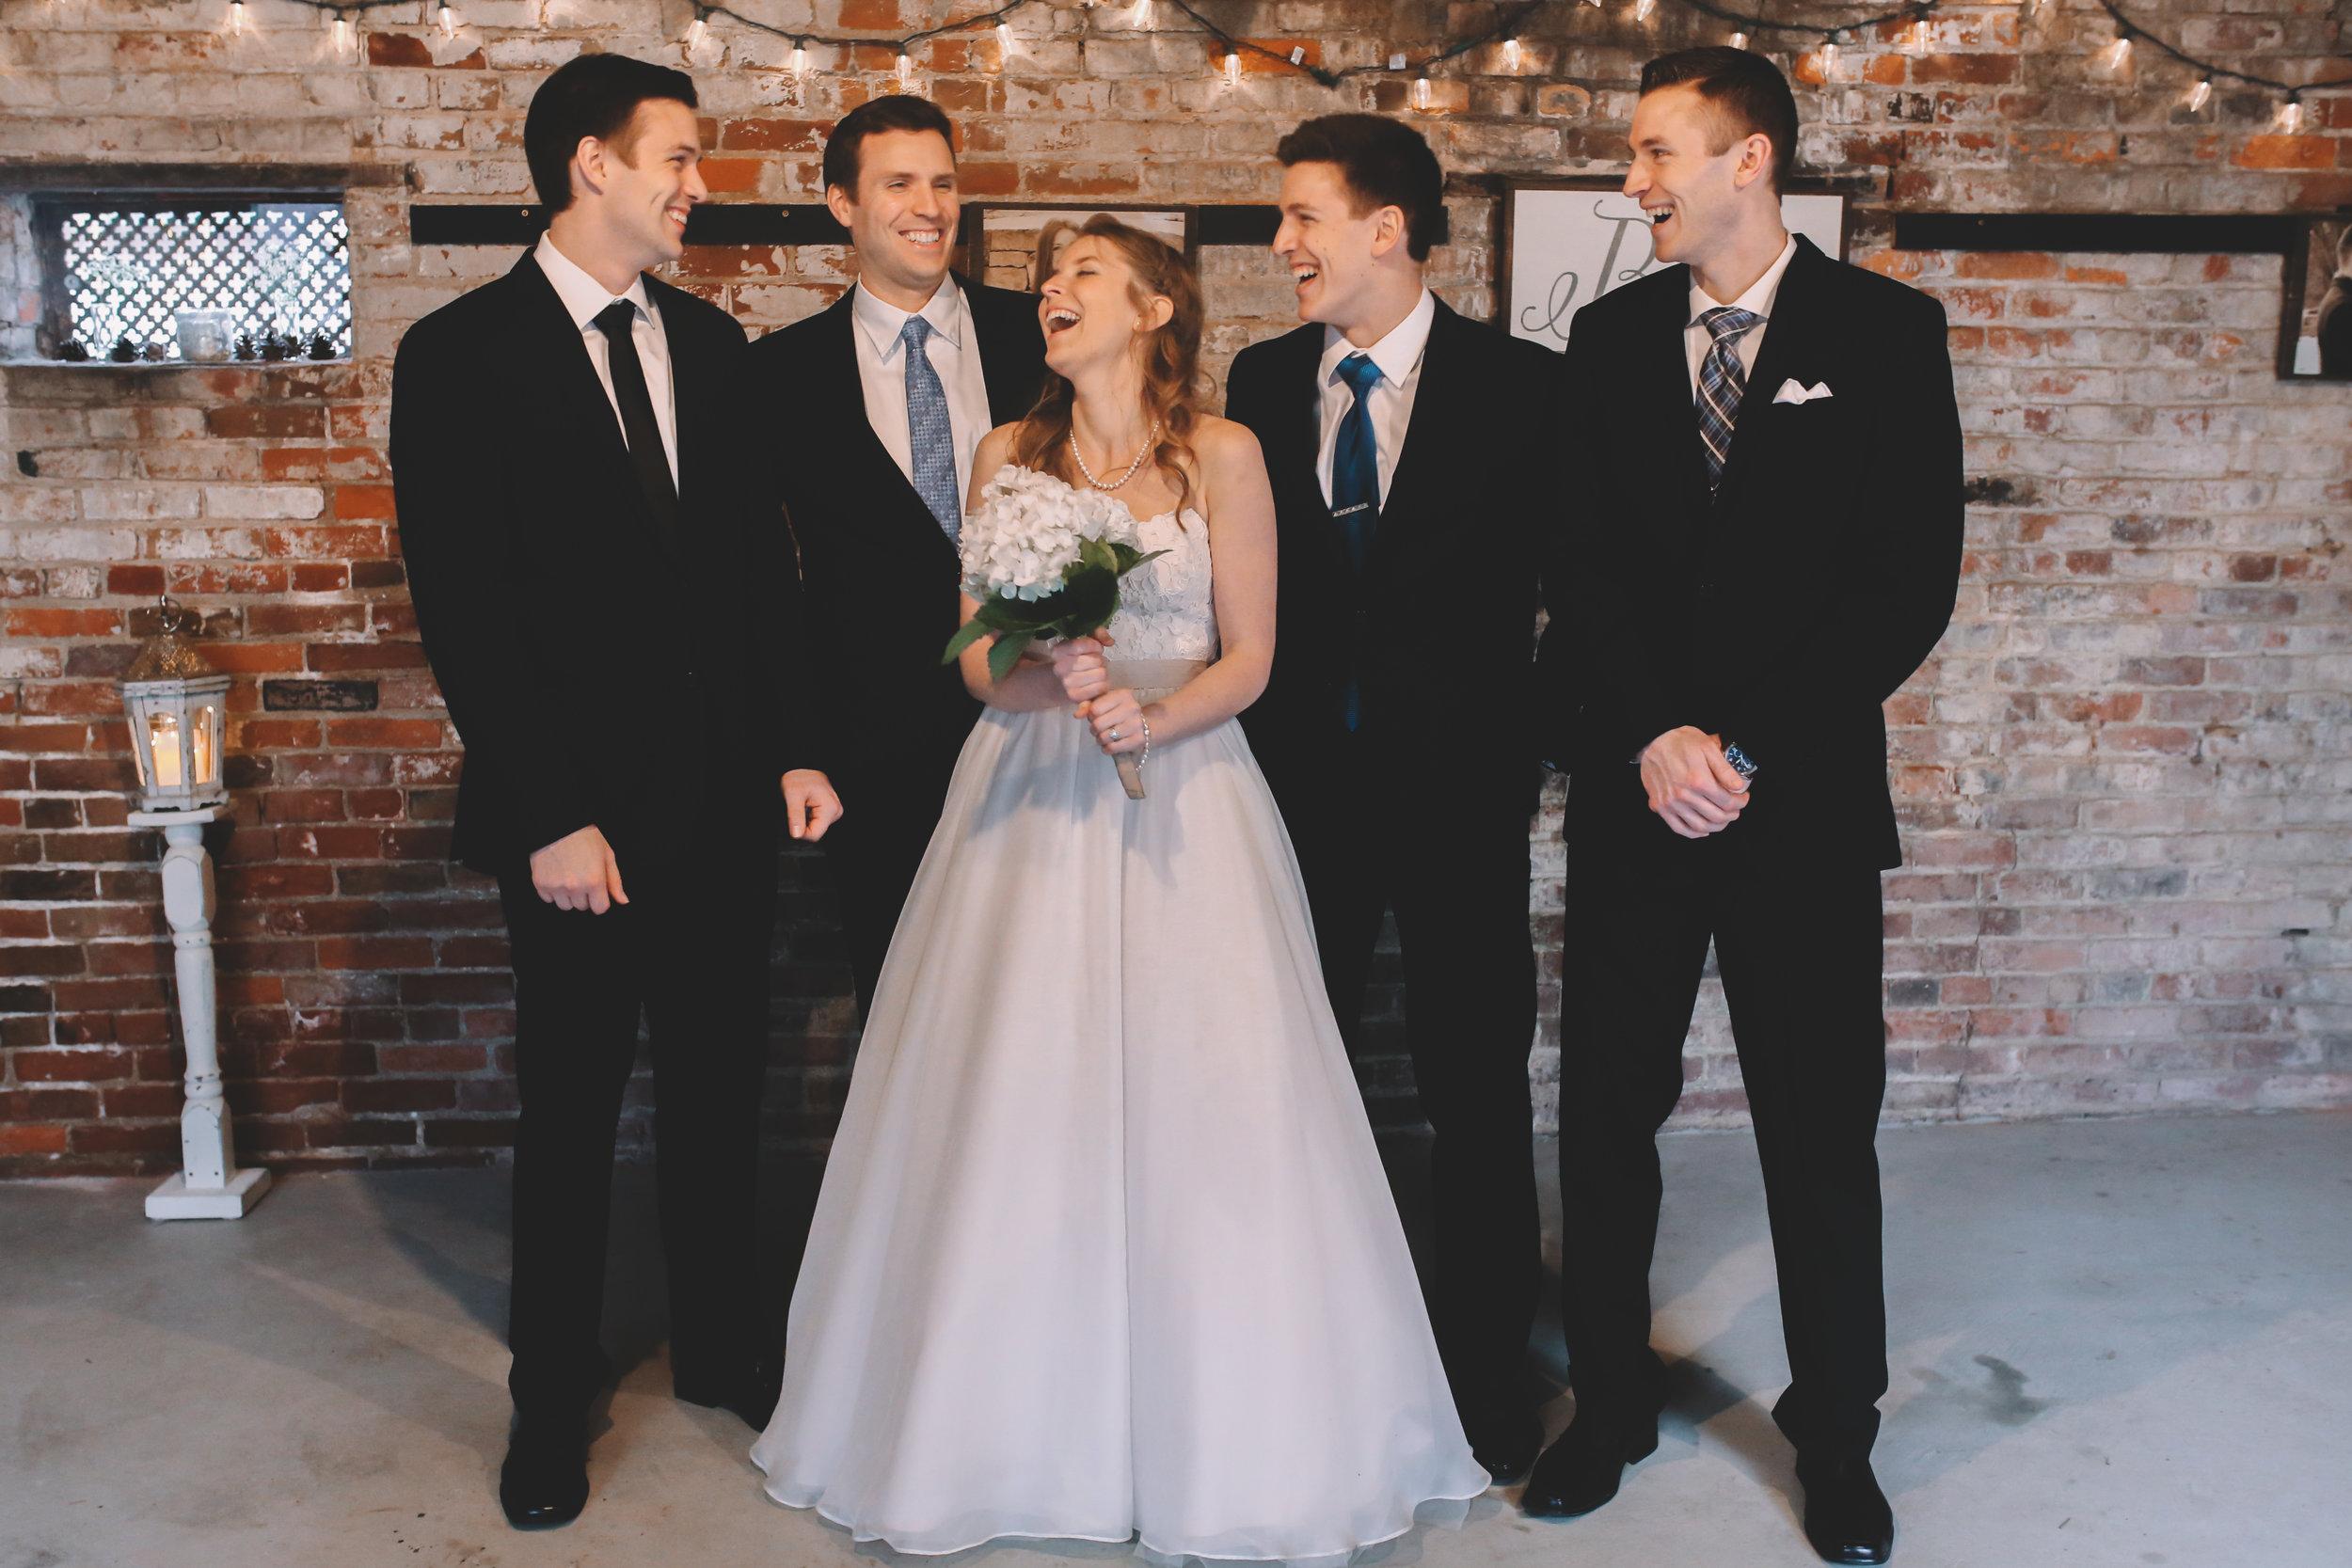 Jake + Brittney Balbas Airbnb Carriage House Wedding Evansville IN (190 of 426).jpg